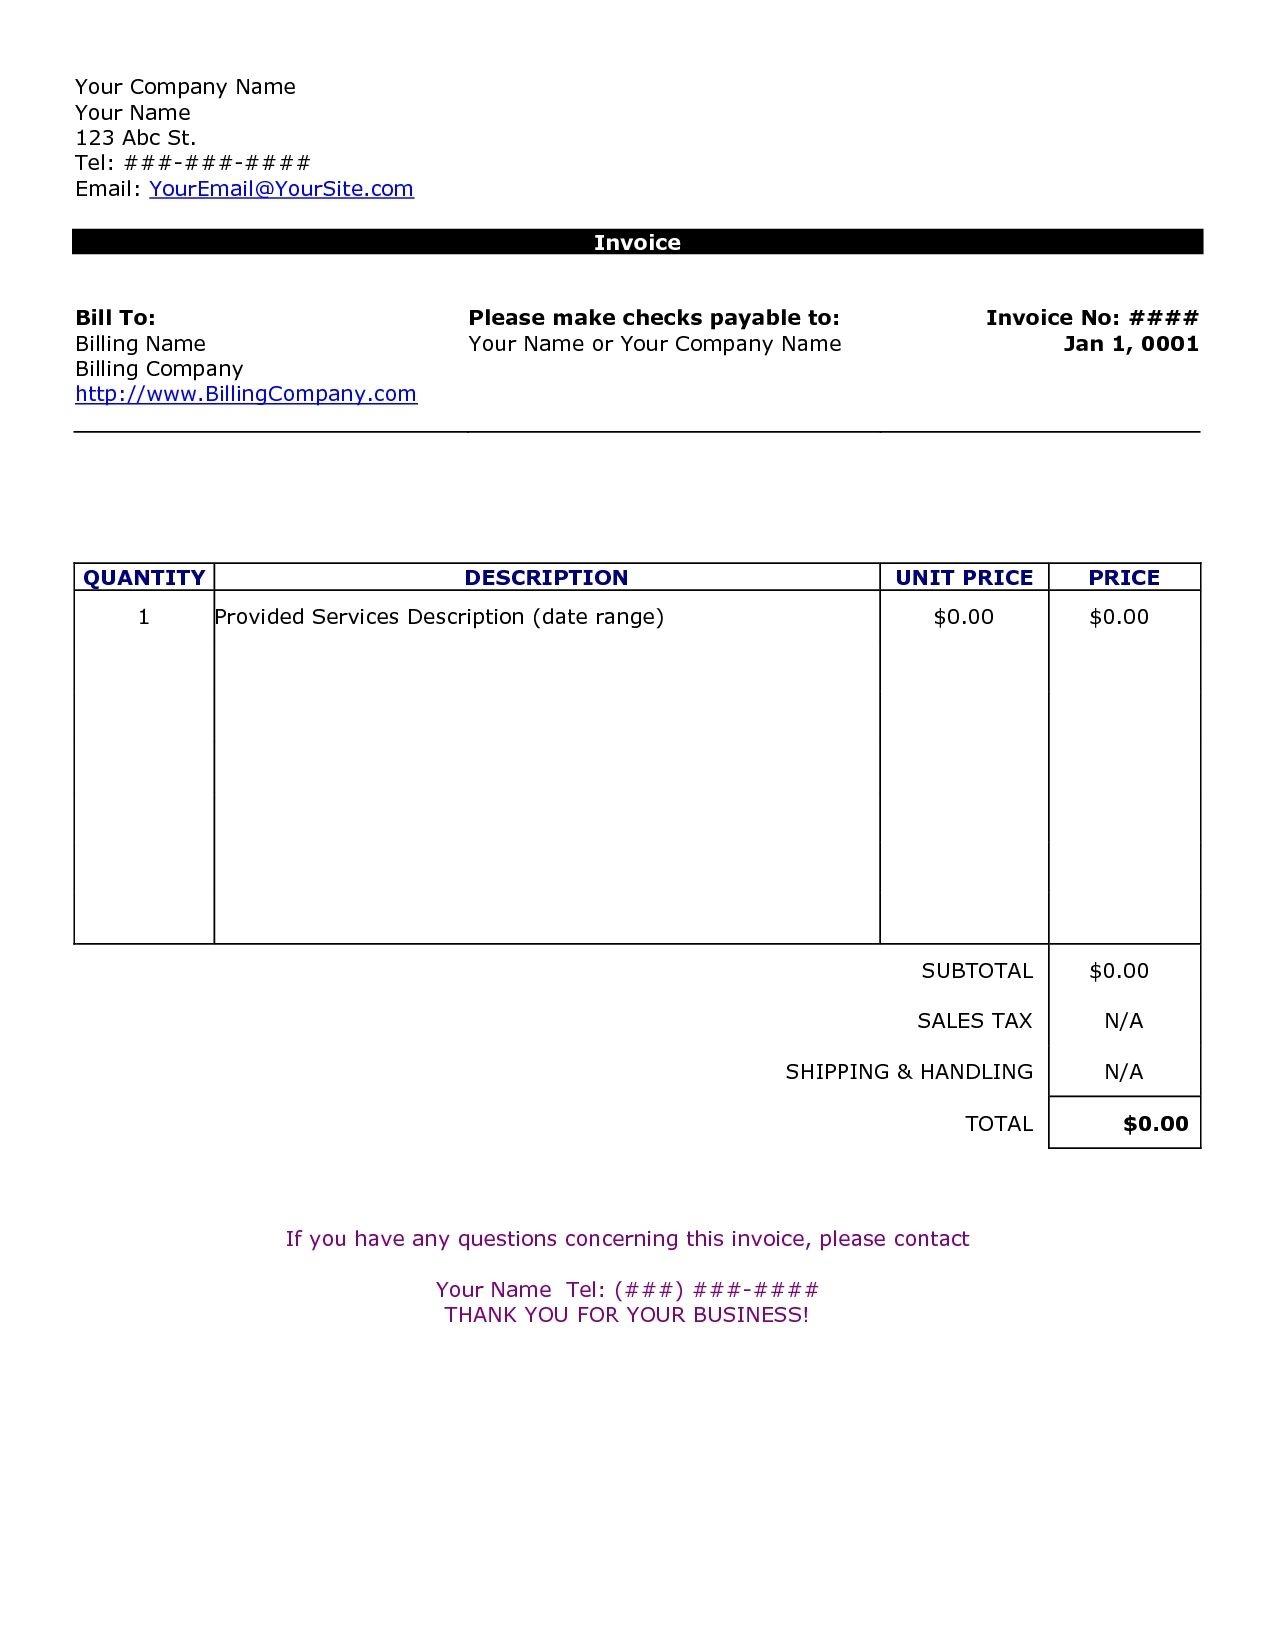 Custom Invoice Format Customizable Form Templates Customs Proforma - Invoice Templates Printable Free Word Doc